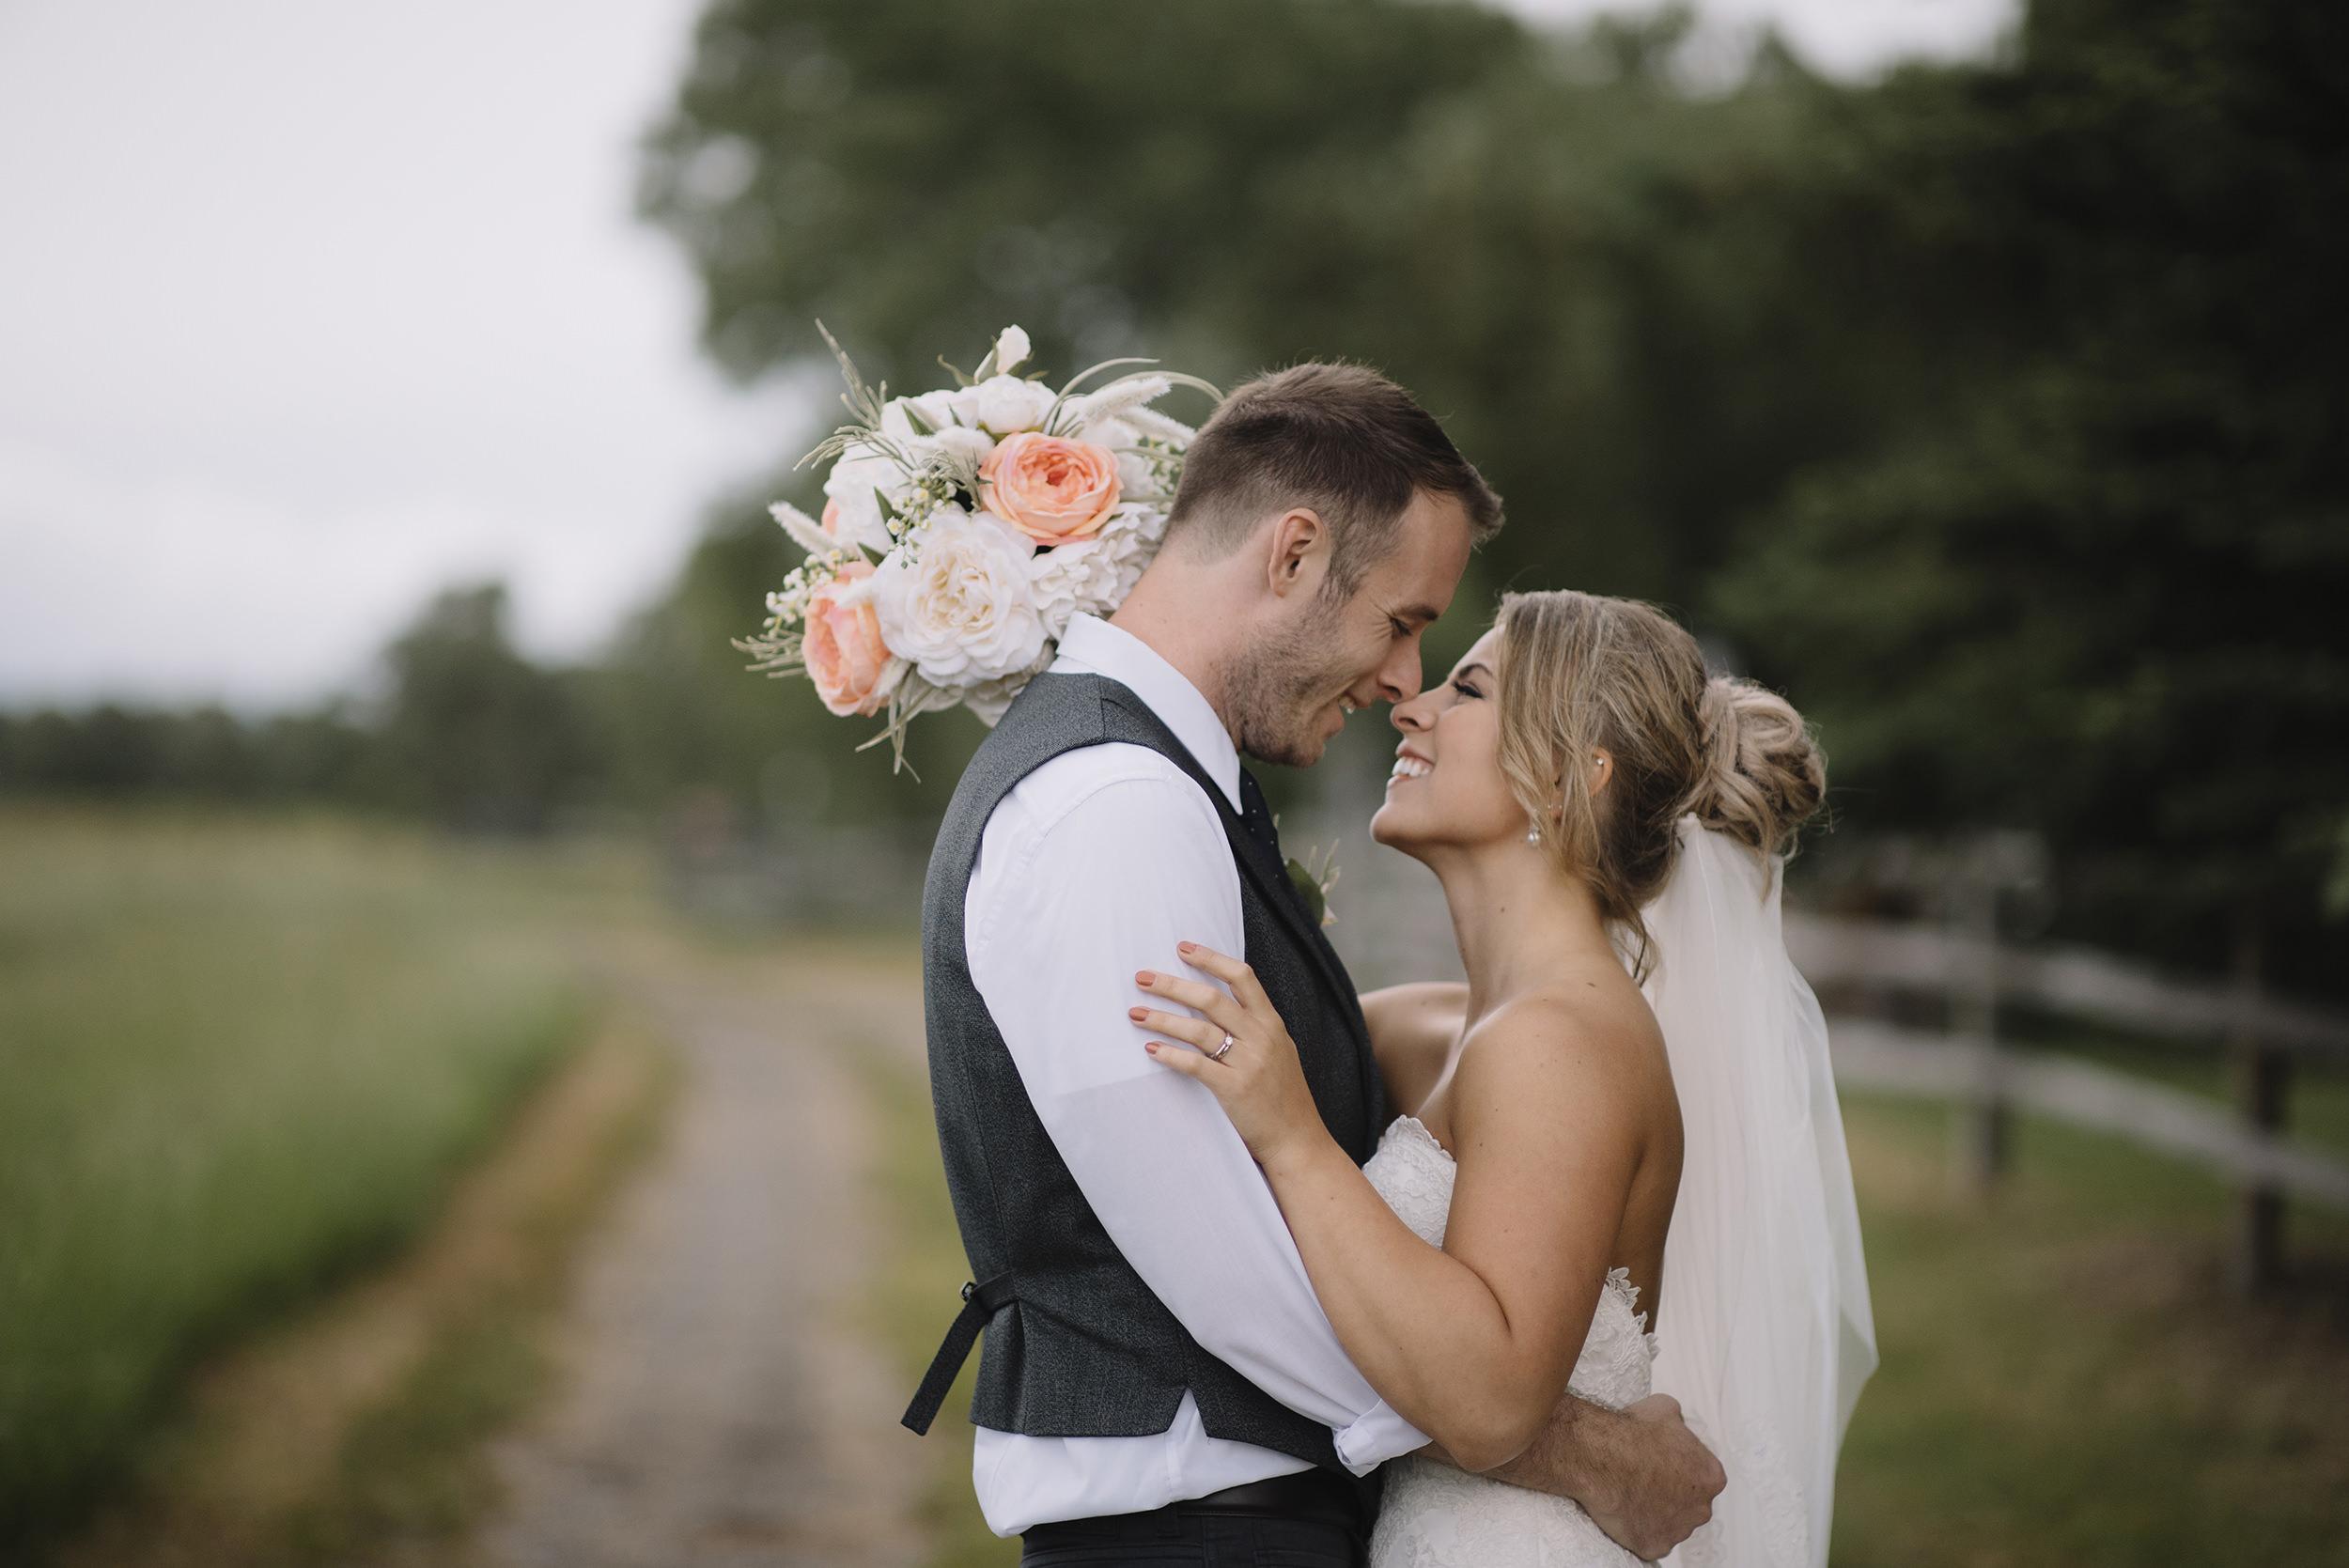 Colby-and-Jess-Intimate-Backyard-Wedding-Bozeman-Montana259.jpg